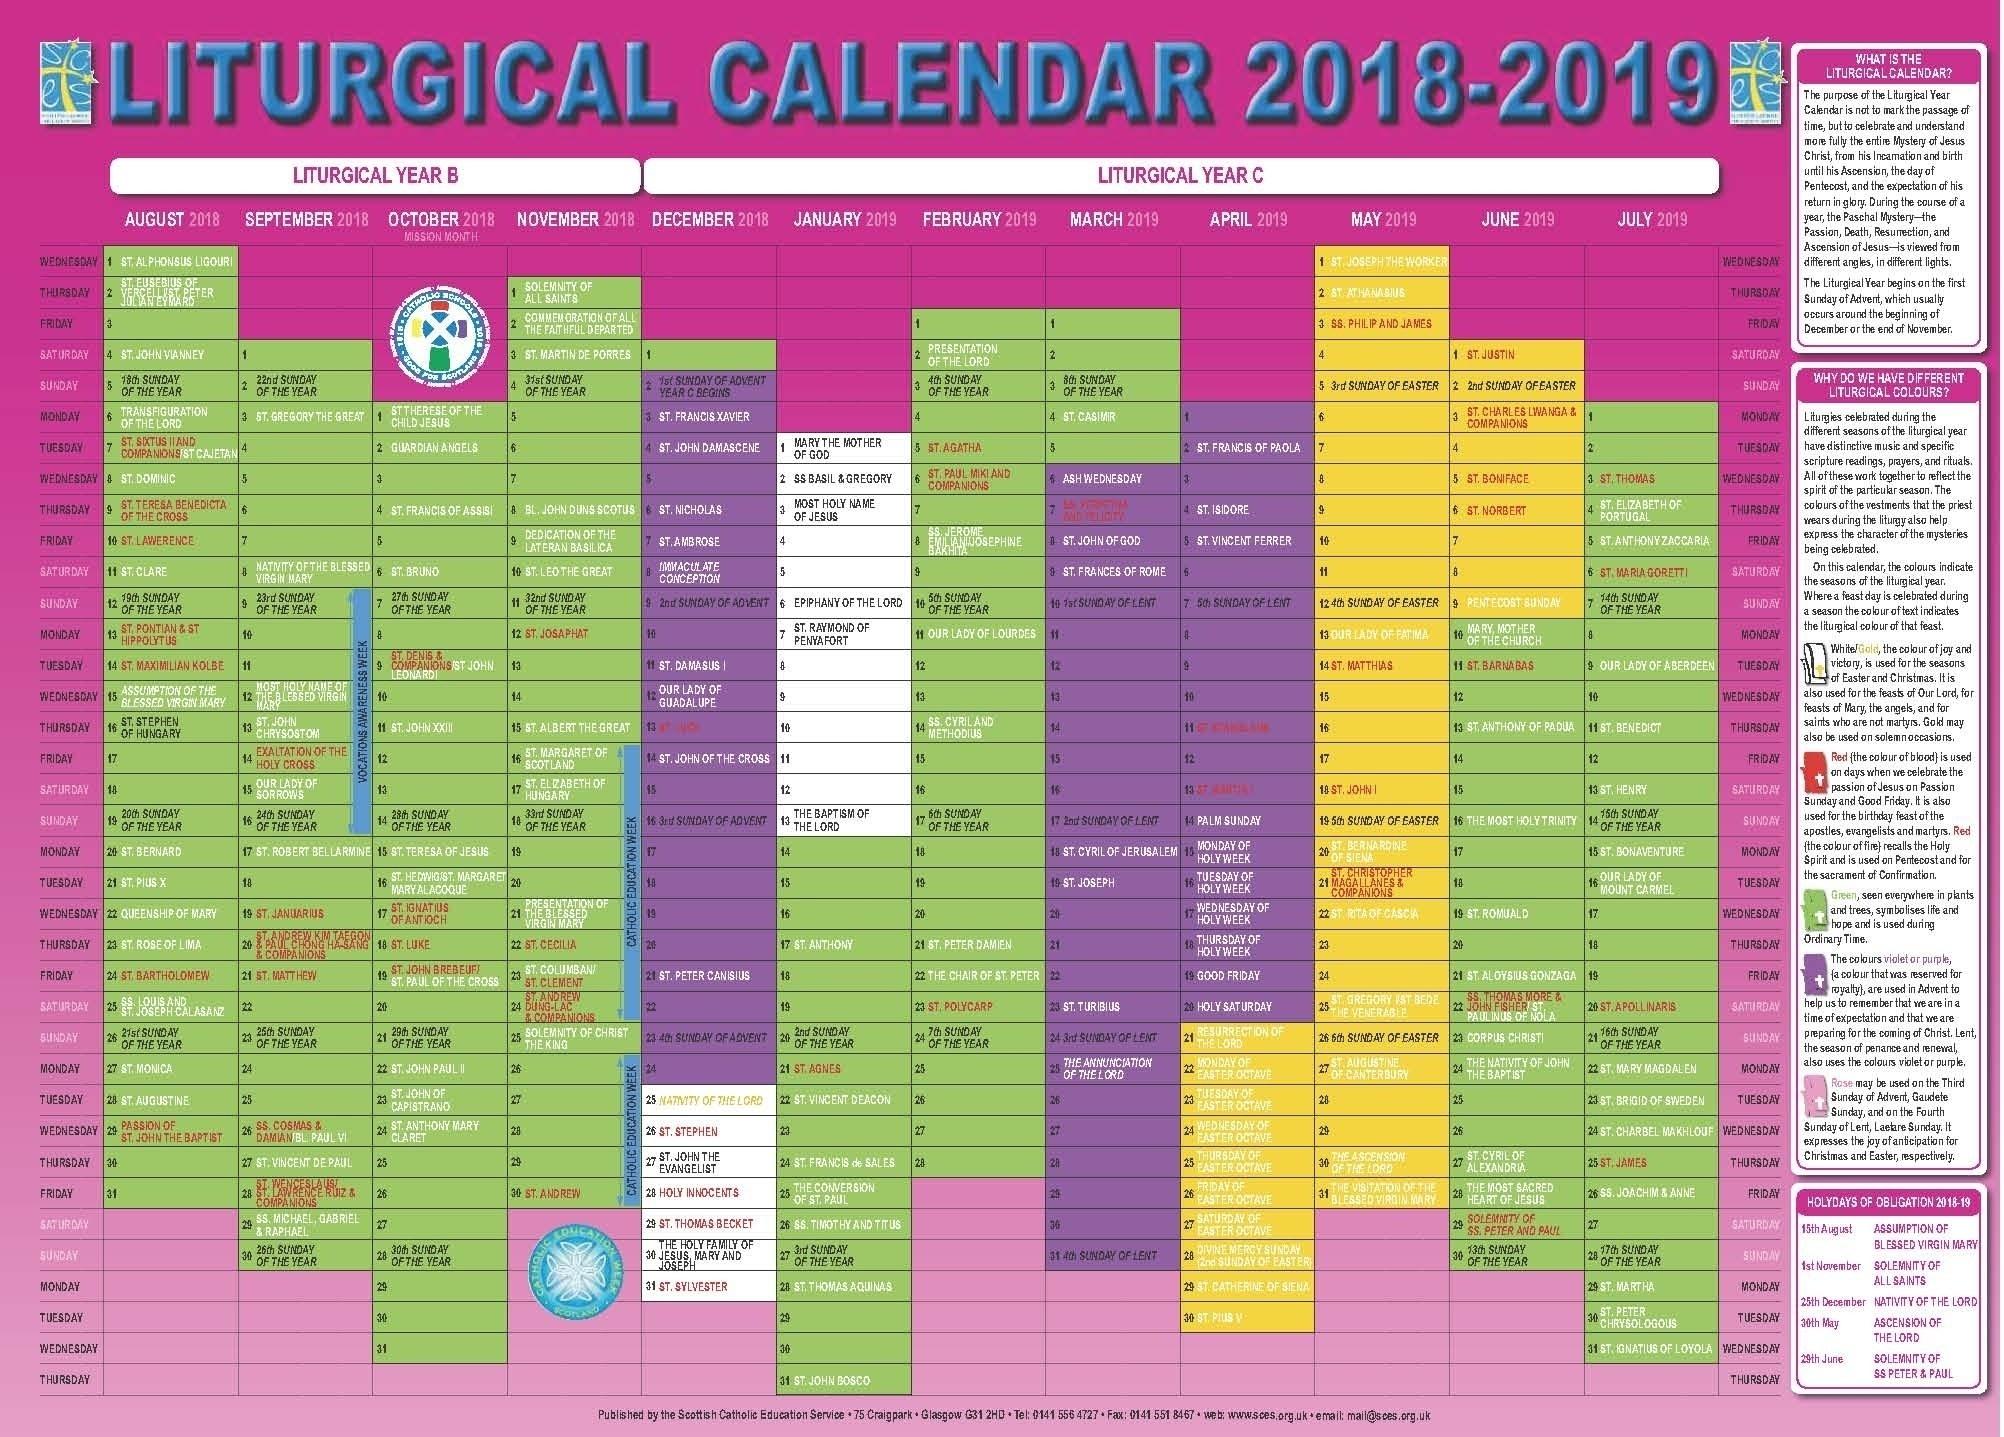 Liturgical Church Calendar Worksheet | Printable Worksheets intended for Catholic Liturgical Calendar 2019 2020 Free Print